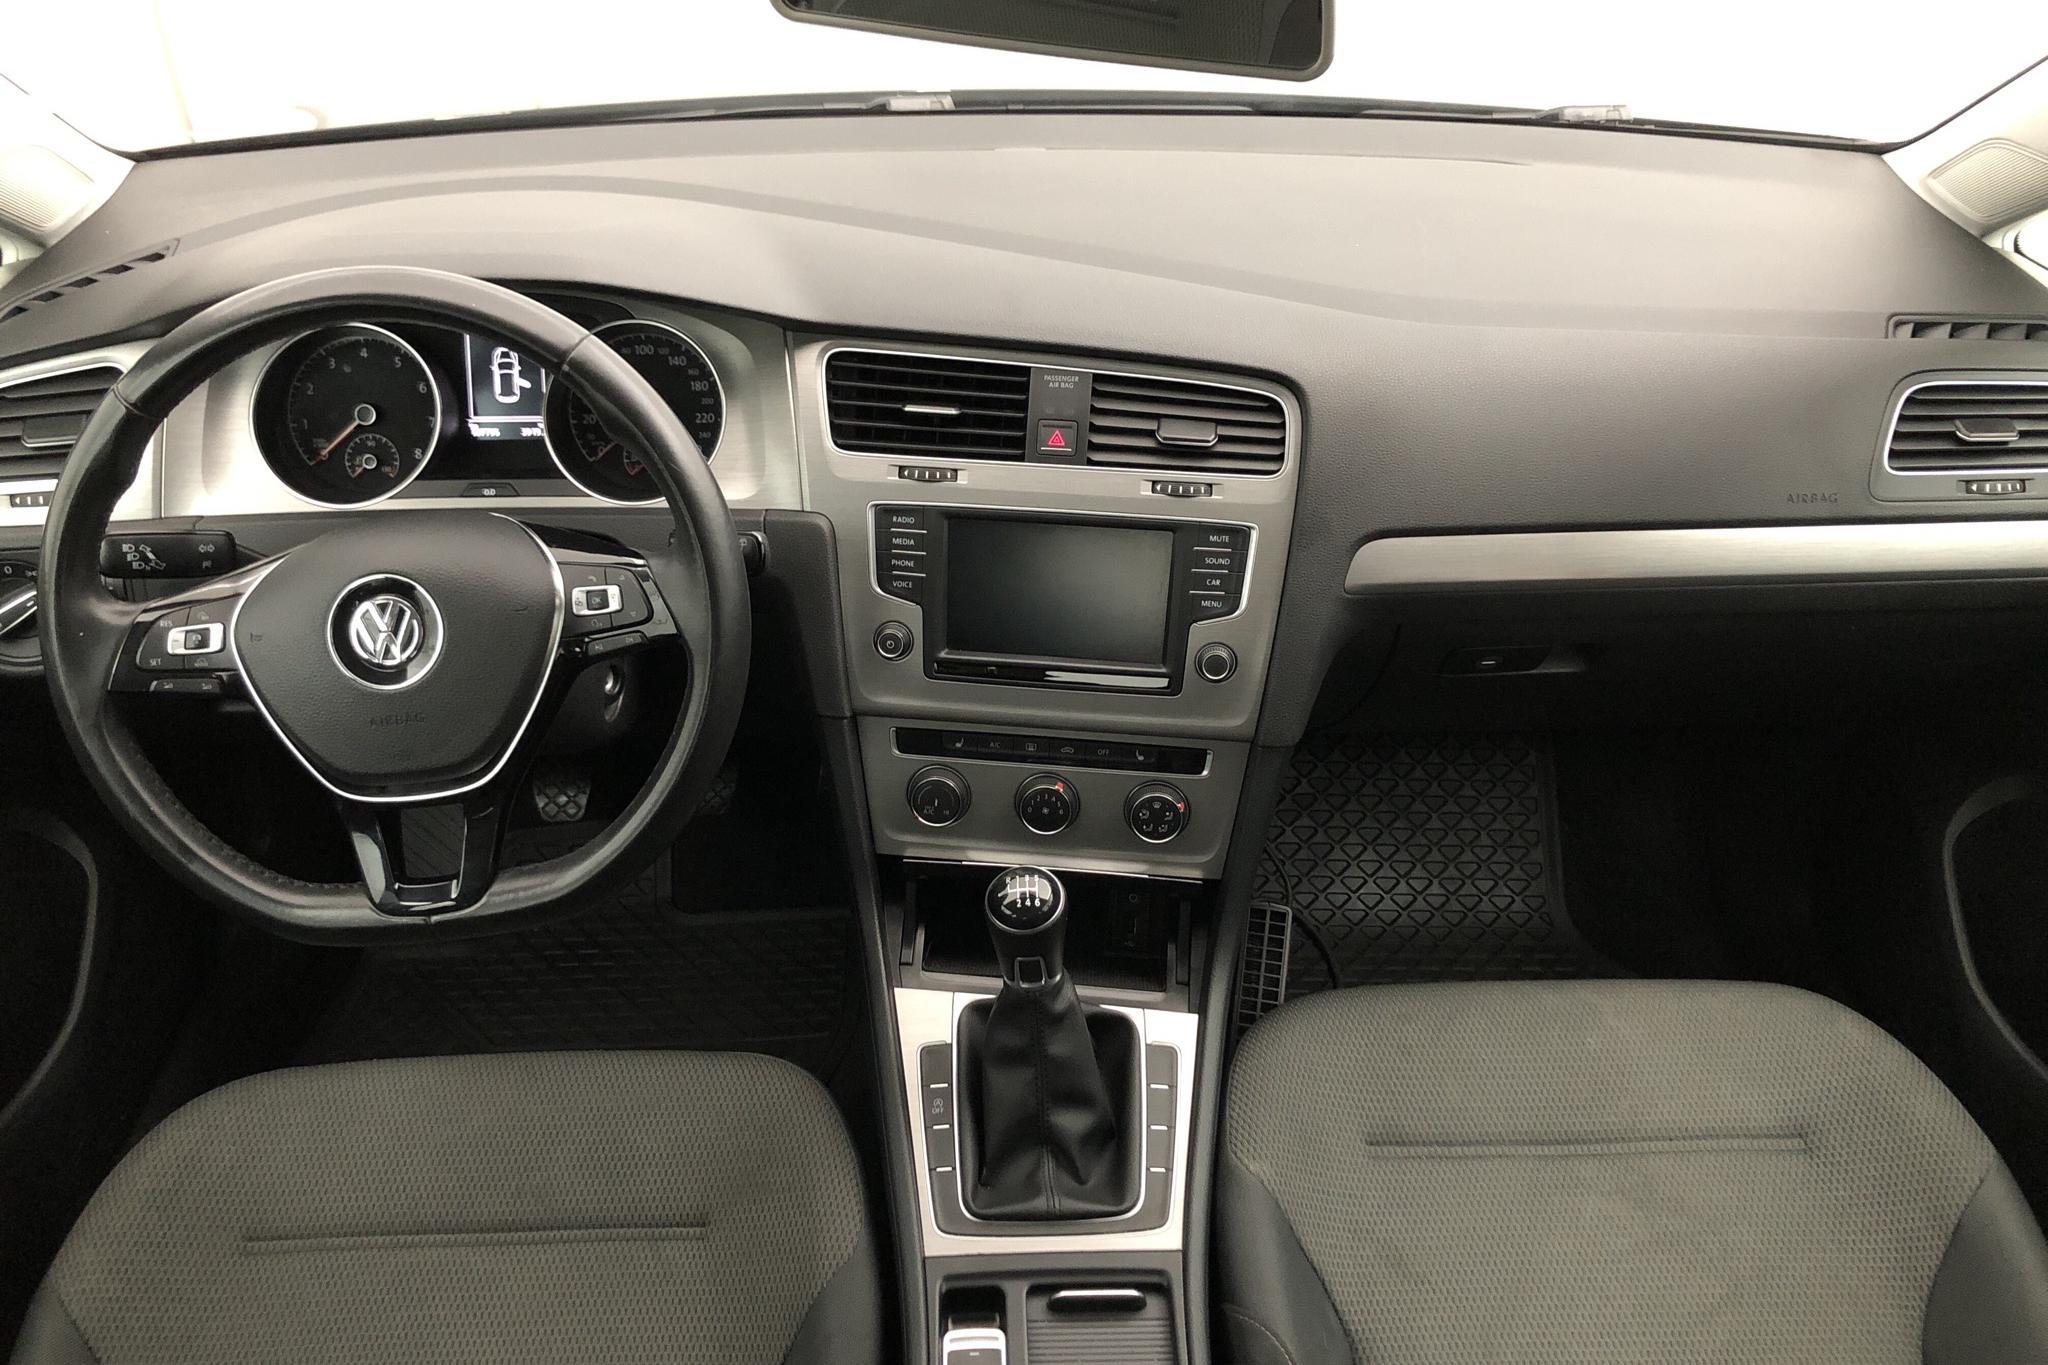 VW Golf VII 1.2 TSI 5dr (110hk) - 107 790 km - Manual - black - 2016